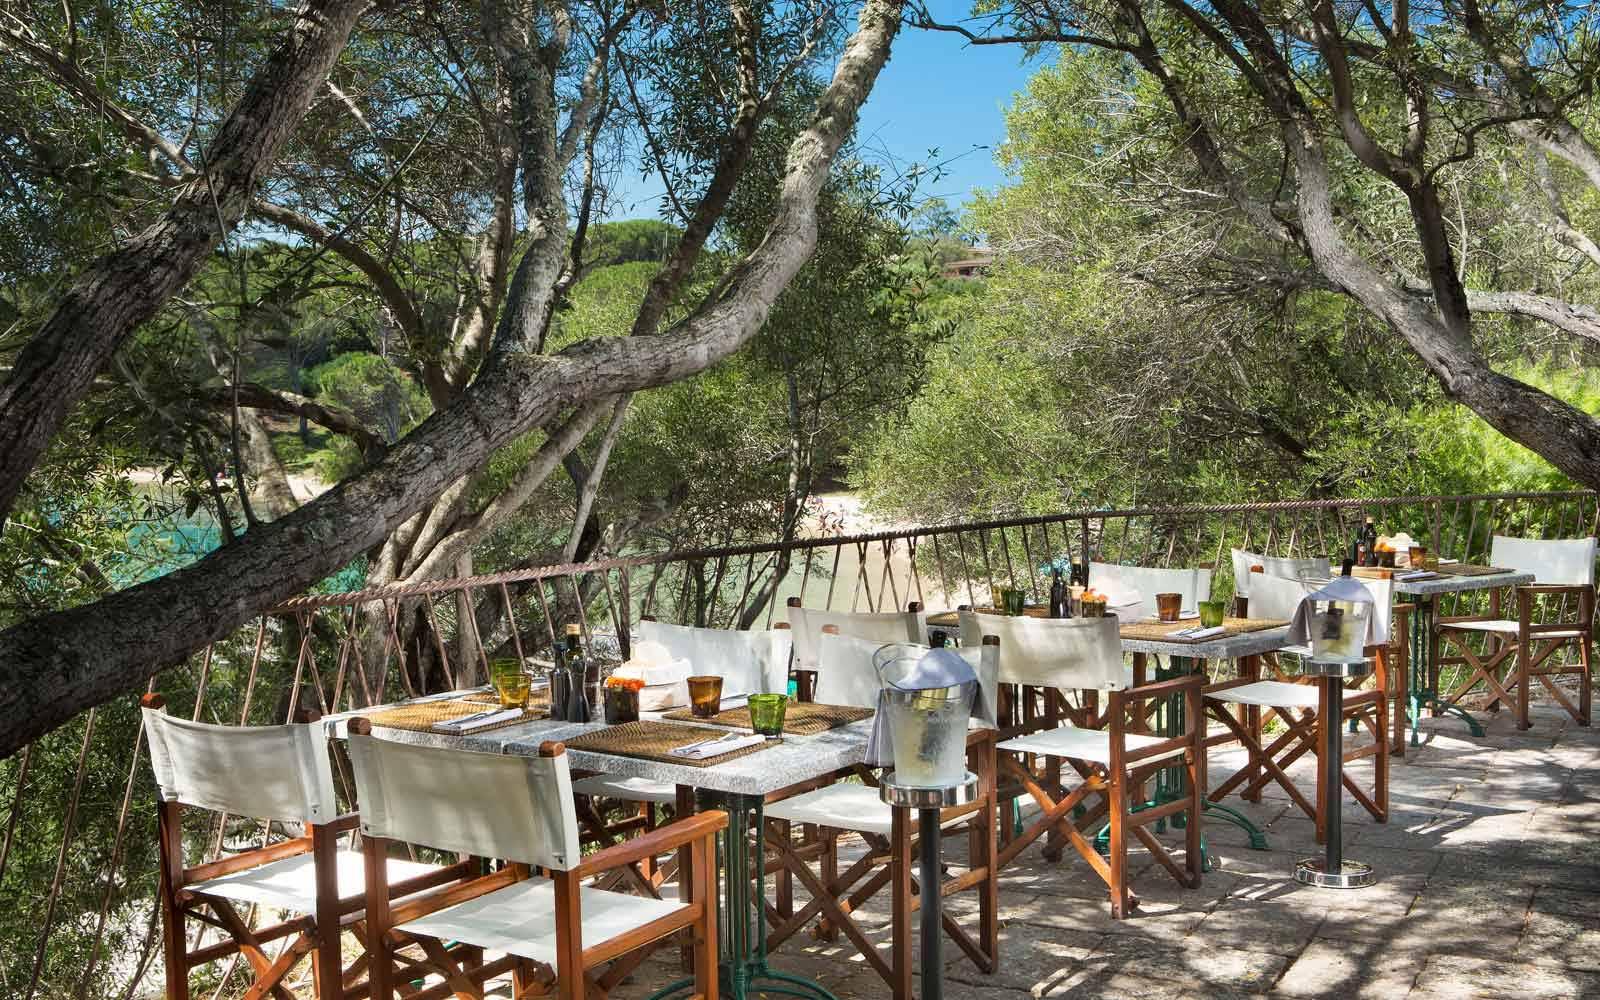 L'Approdo Restaurant at Hotel Capo D'Orso Thalasso & Spa